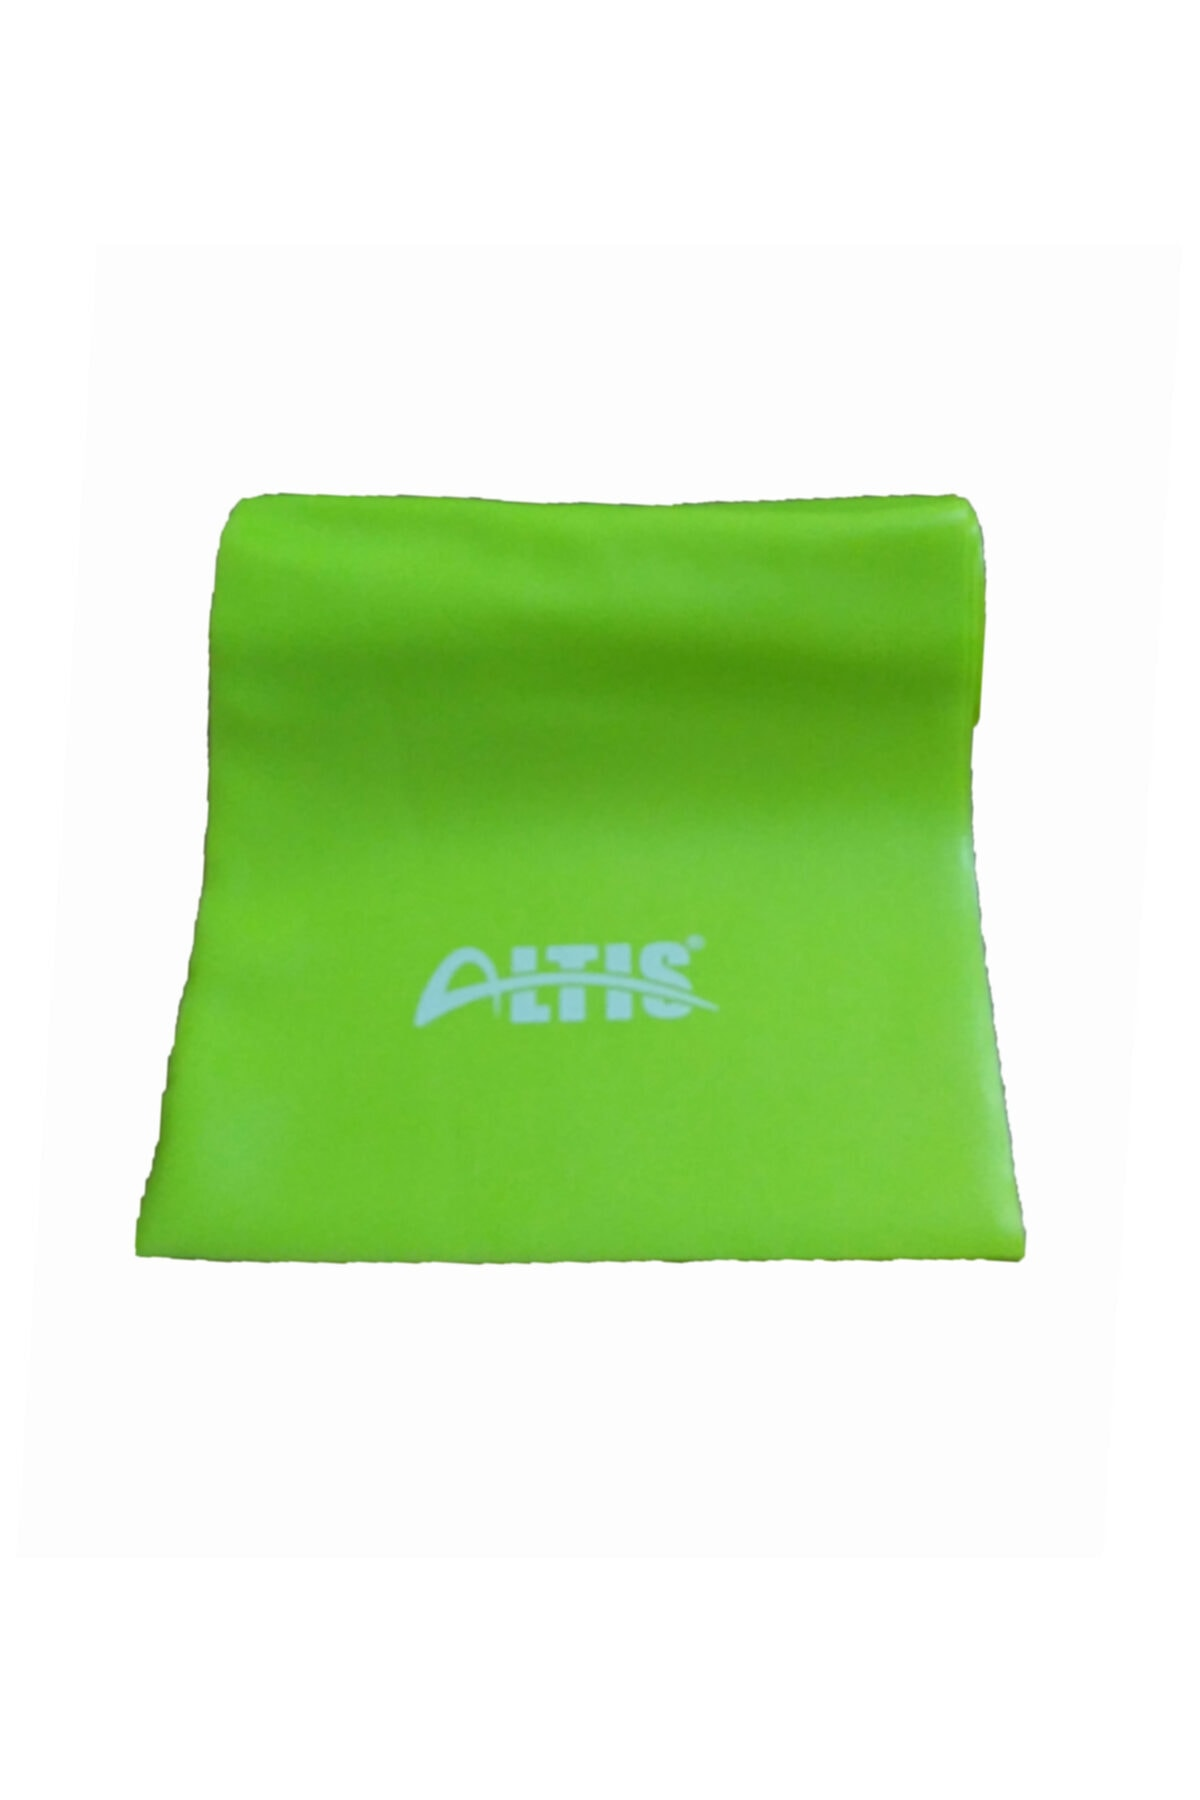 ALTIS Plates Bandı 1